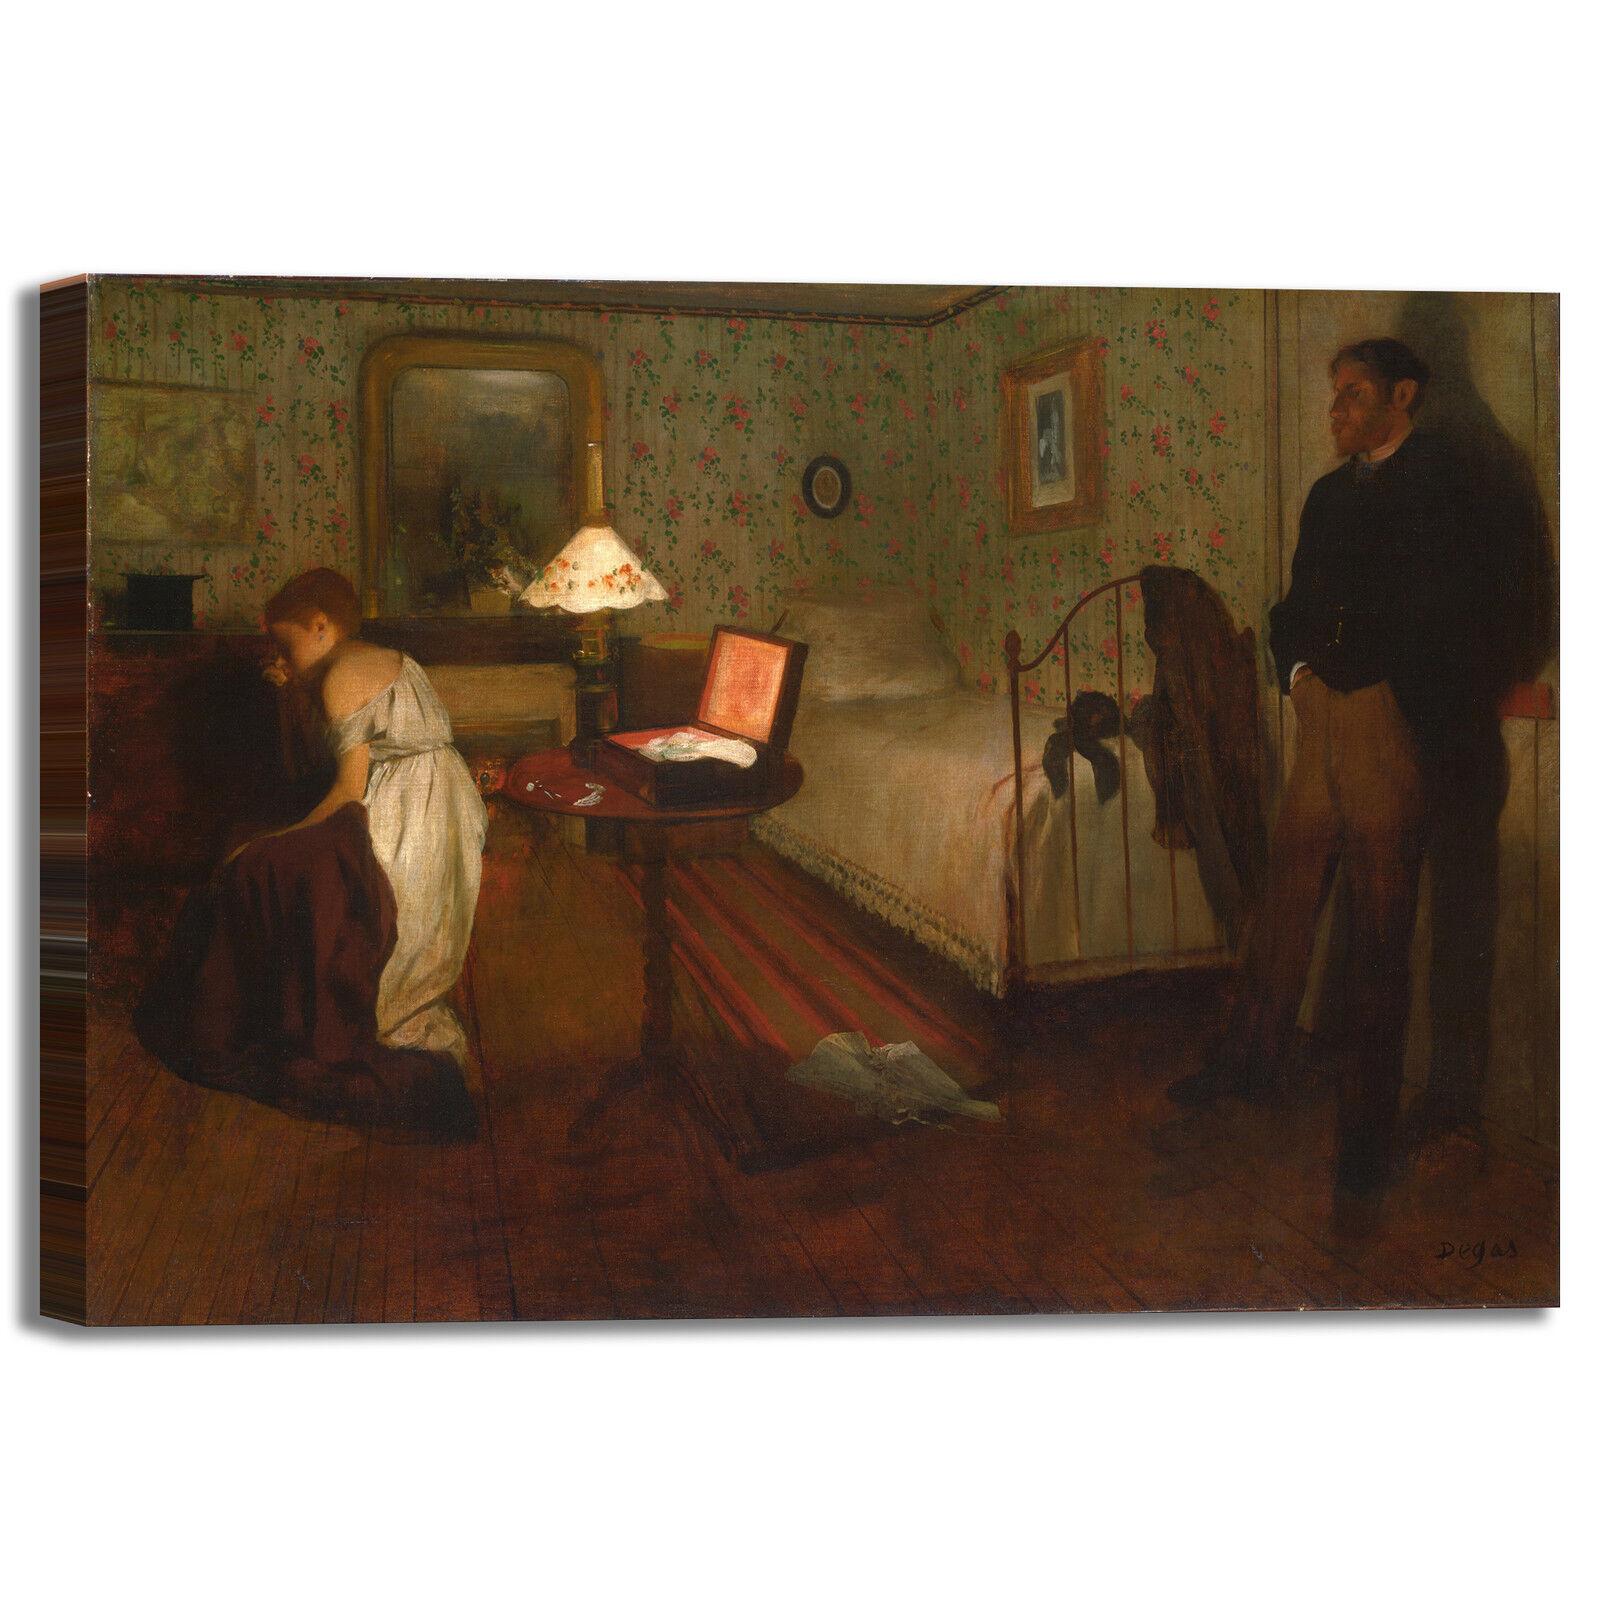 Degas o interno design quadro stampa tela dipinto telaio arRouge o Degas casa a2cdf7